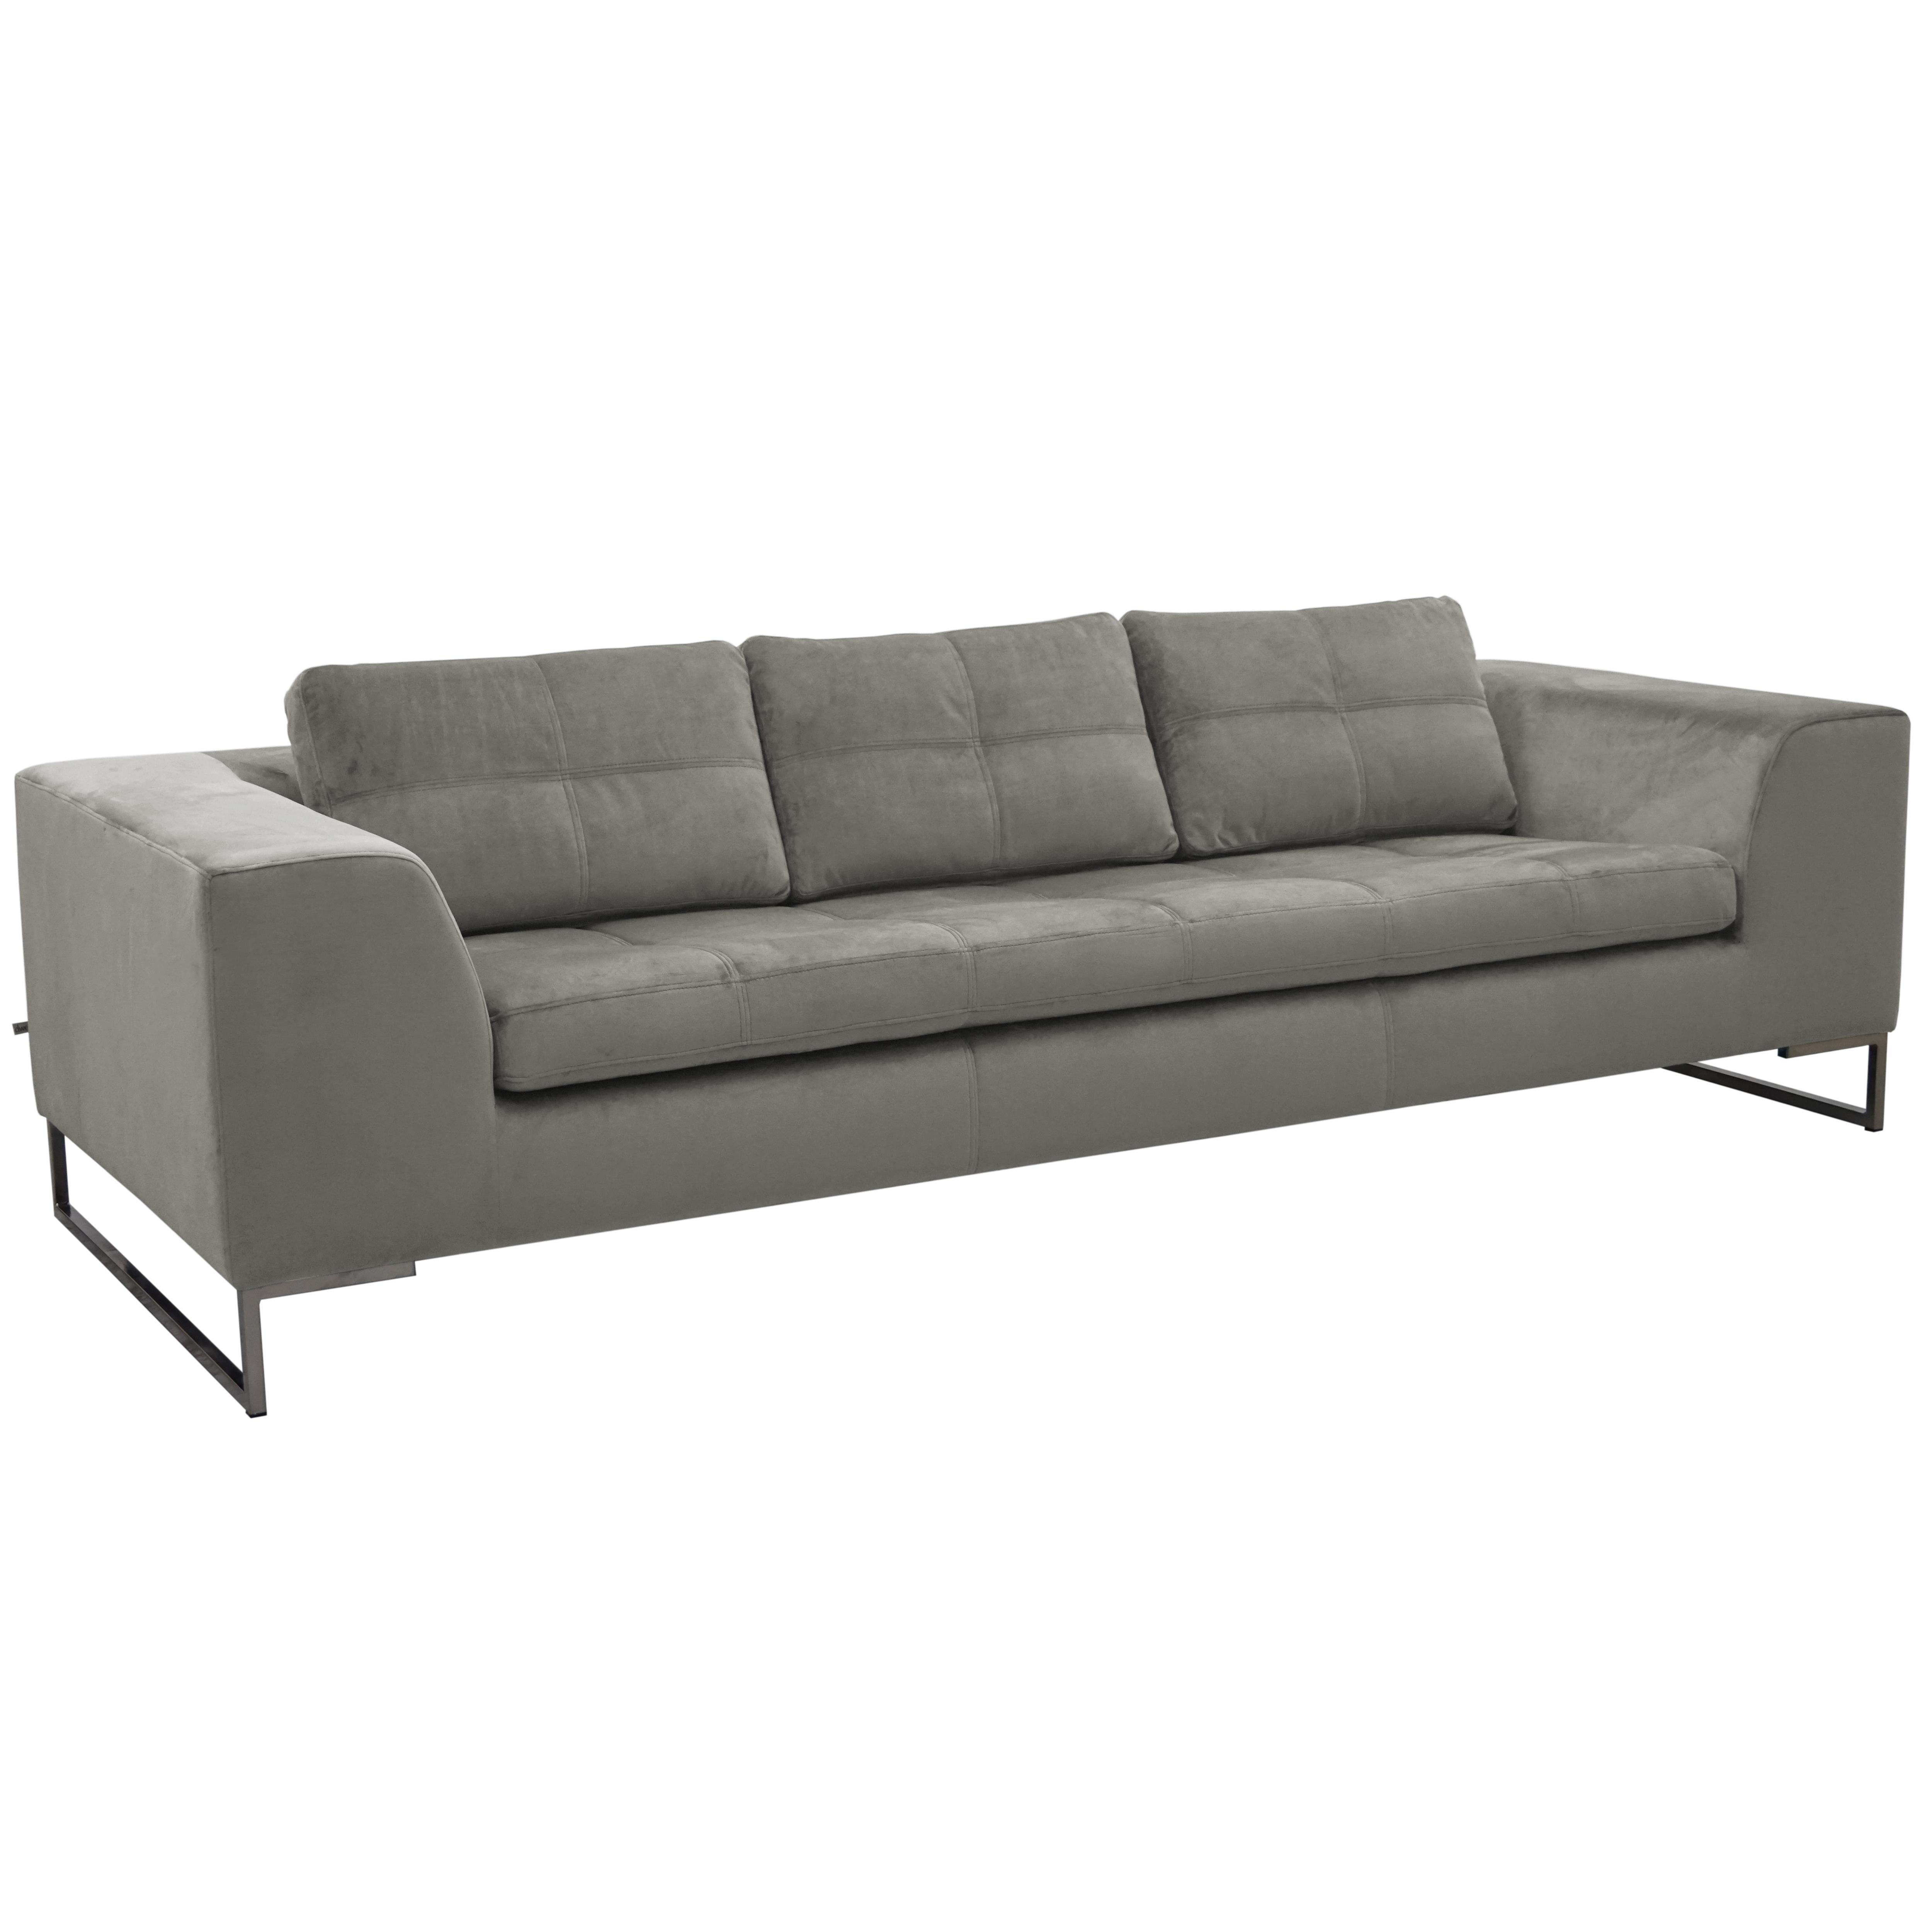 Toleda three seater sofa alba velvet grey